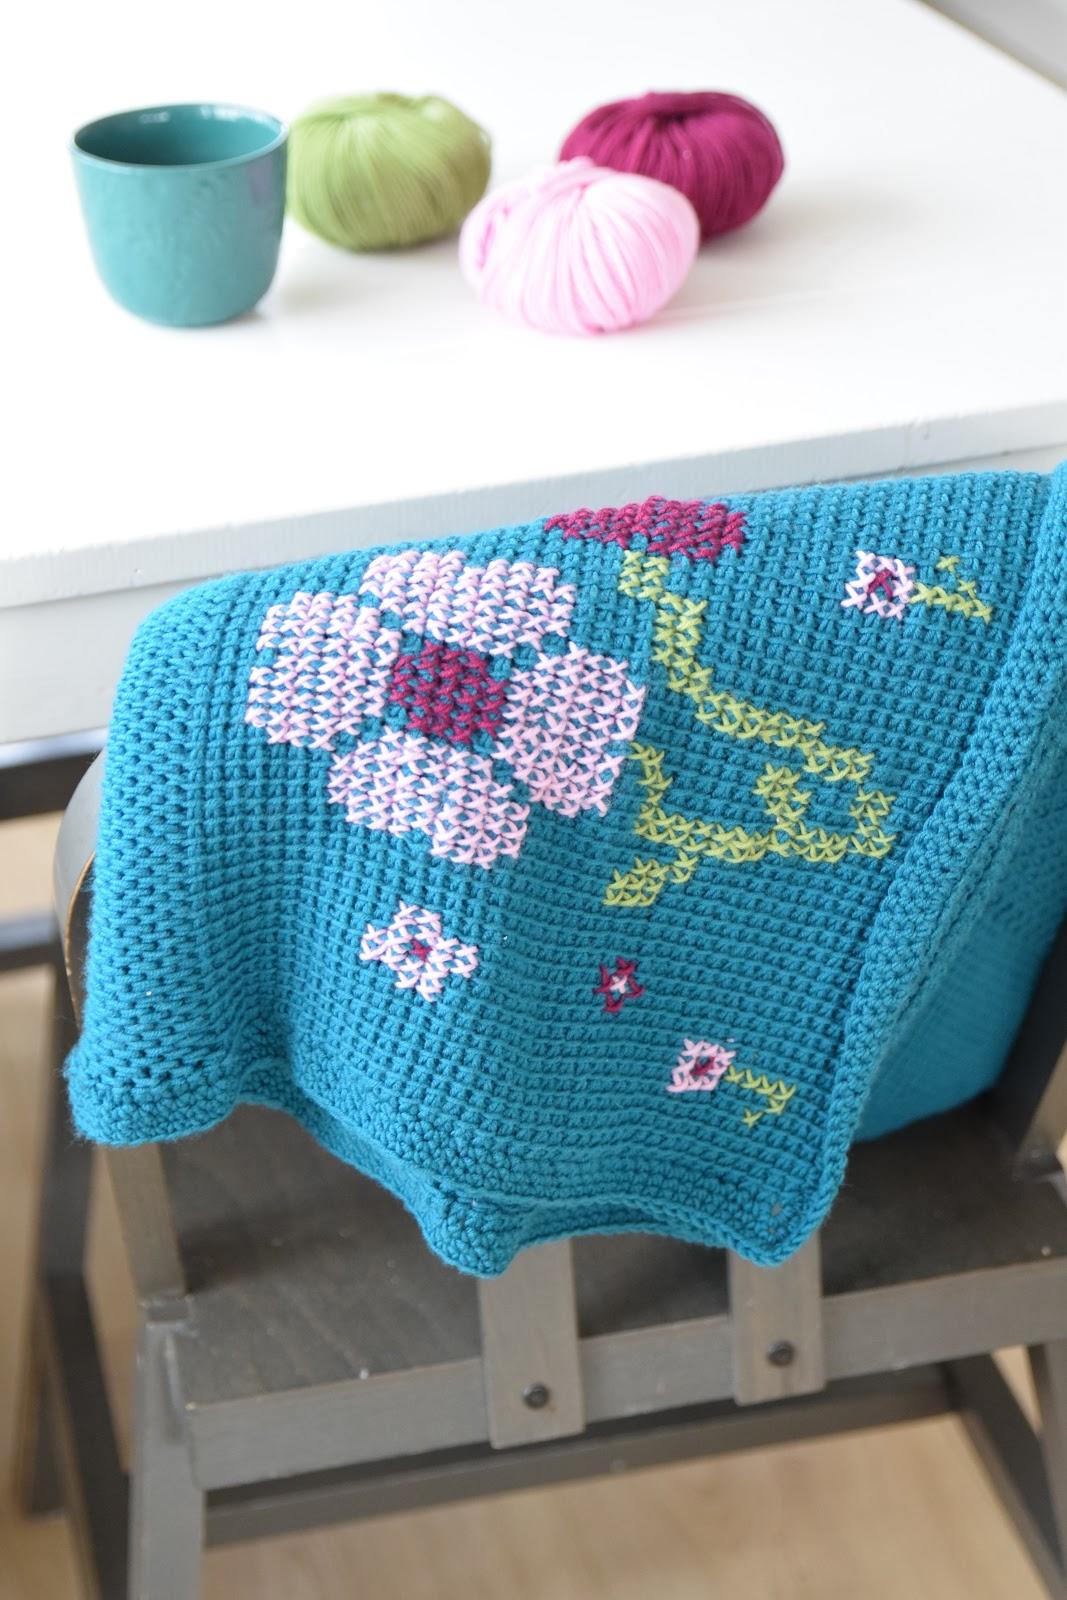 Madebyleen Blog Over Haken Crochet Blog Juni 2018